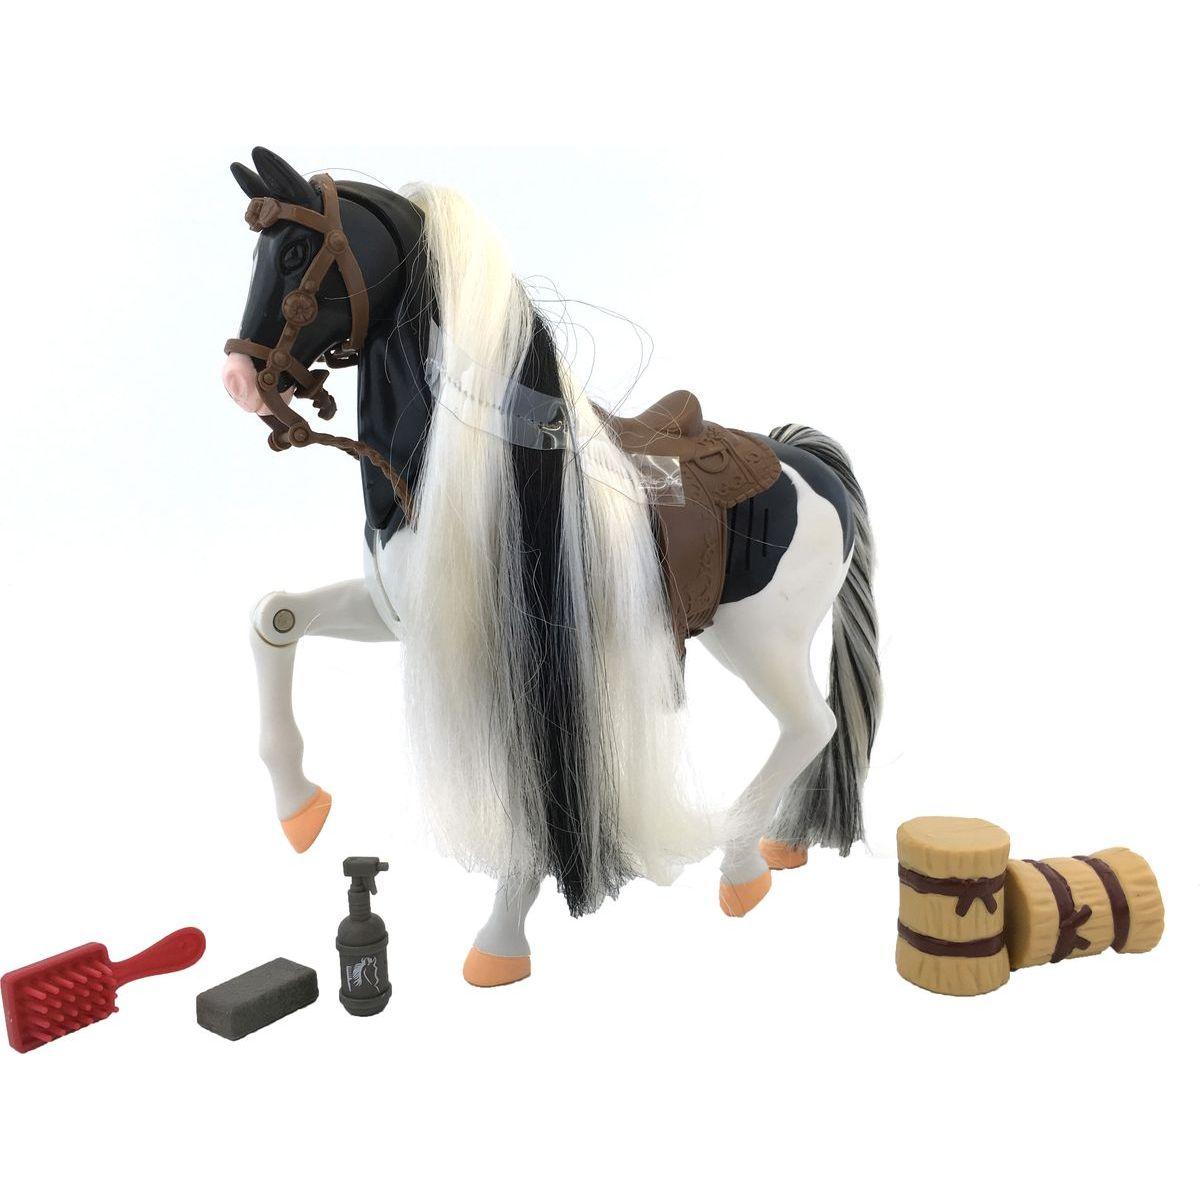 Lanard Kůň set 18 cm - Bílo-černý